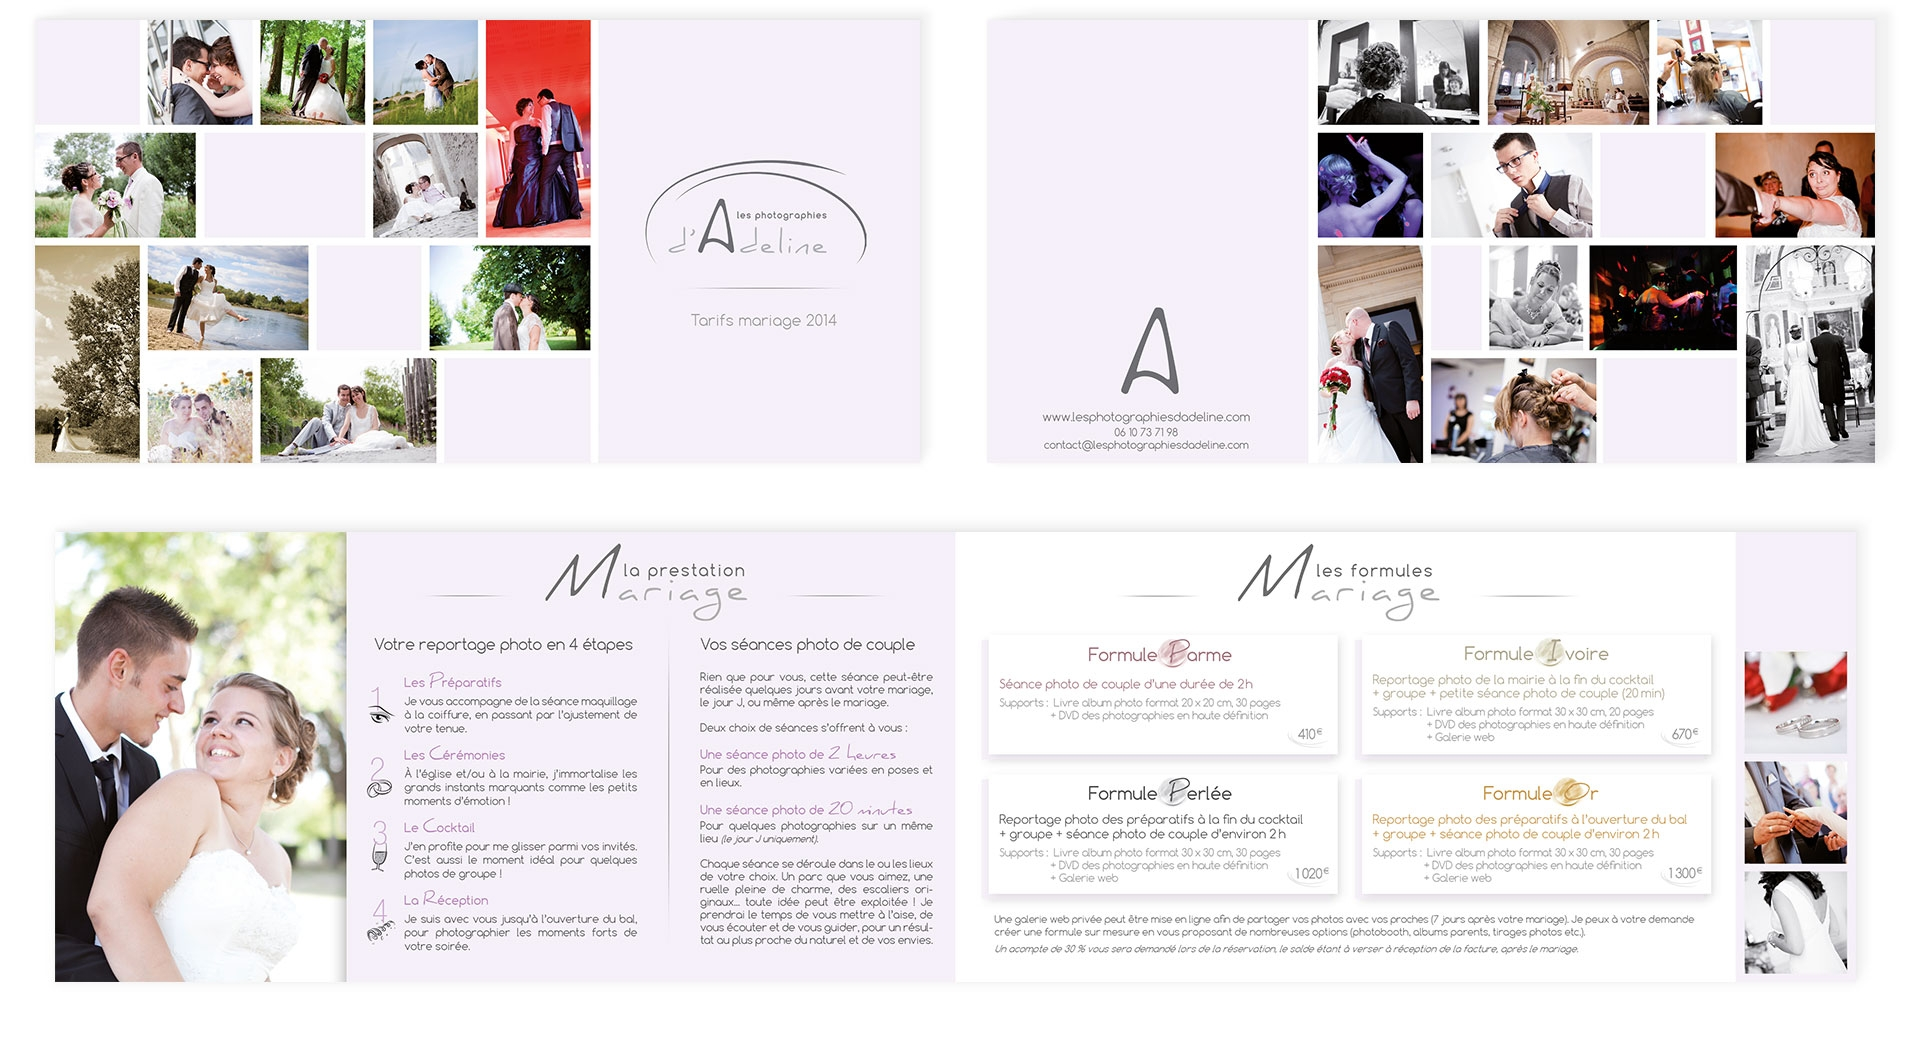 professionnels-print-support-com-plaquette-adeline-01